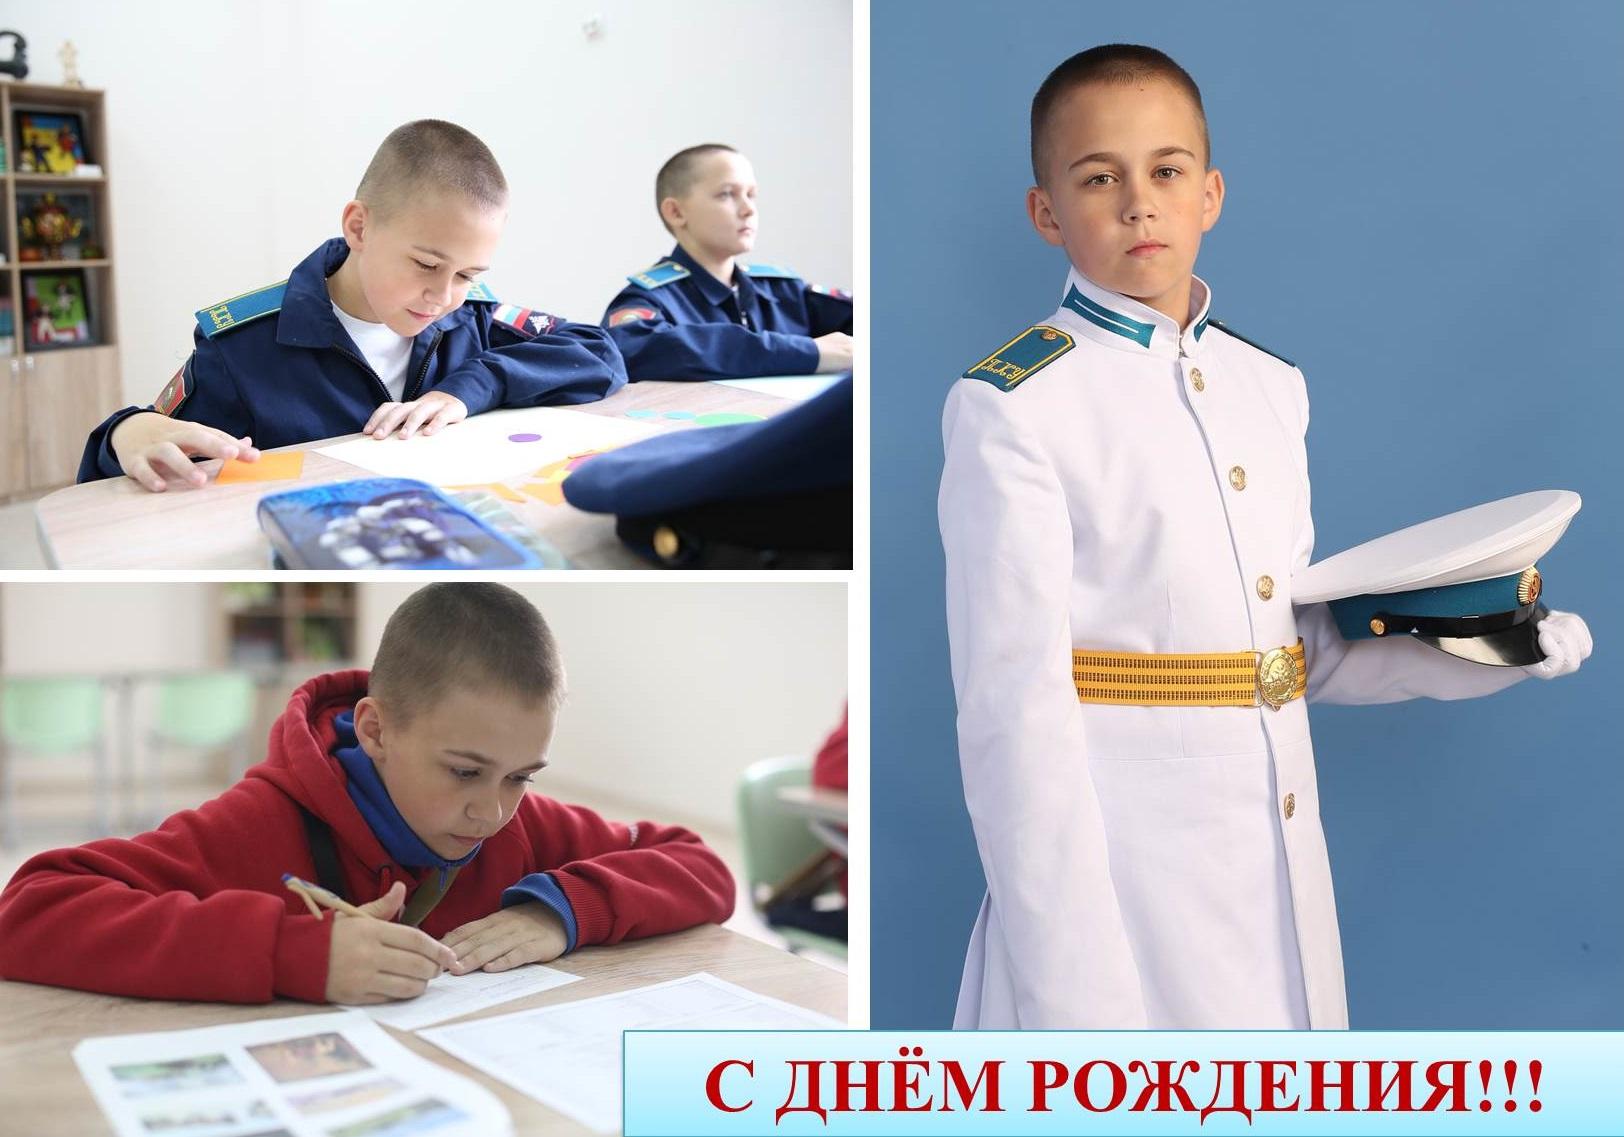 ПАршиков